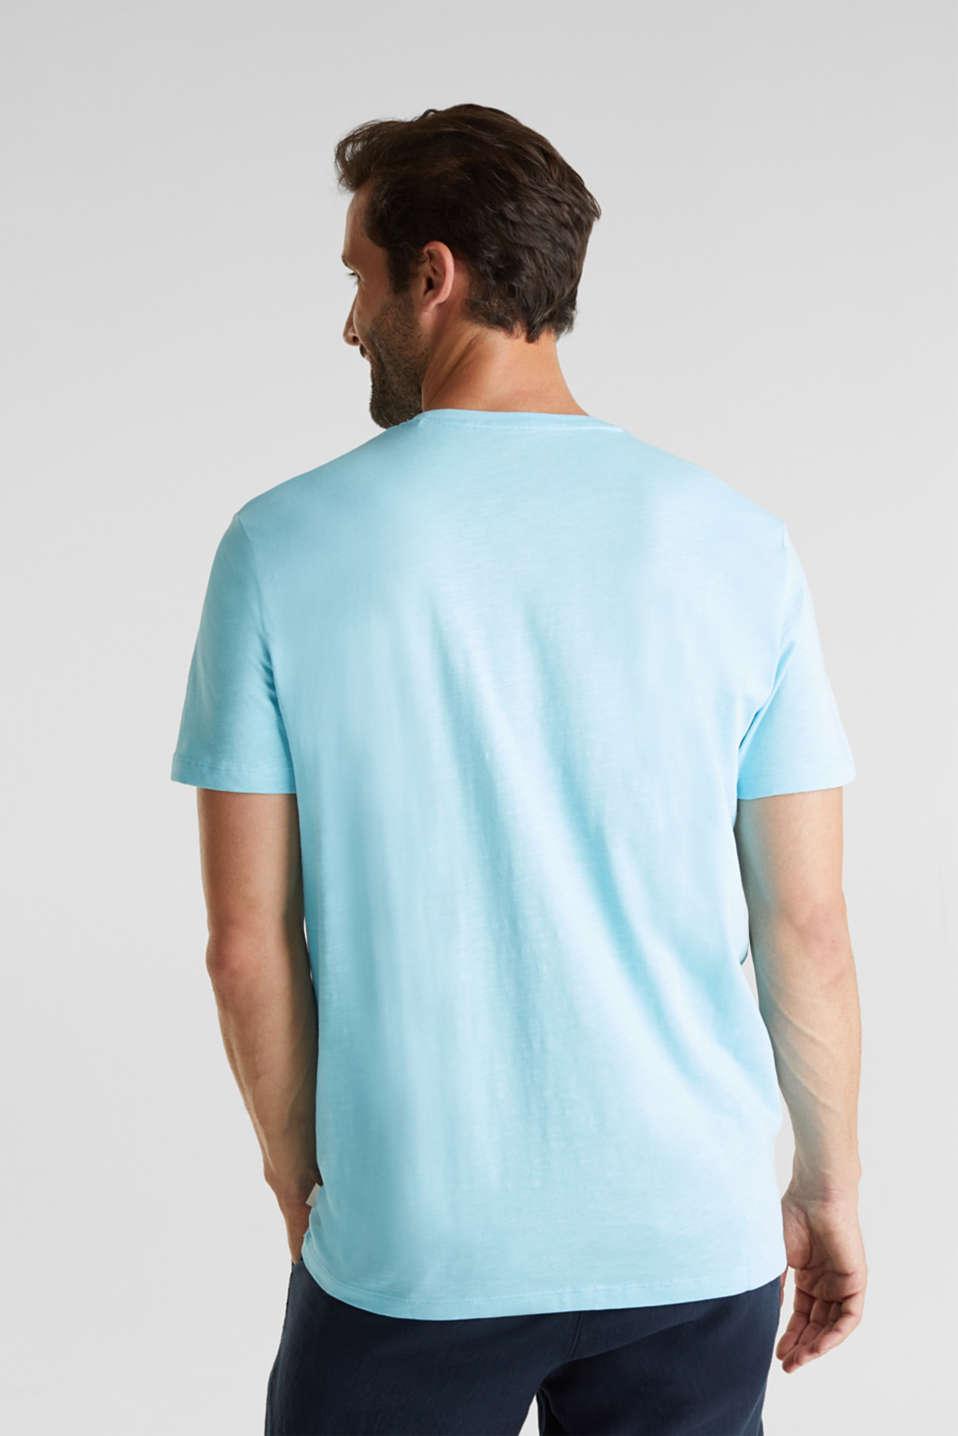 Jersey top, 100% organic cotton, LIGHT BLUE, detail image number 3